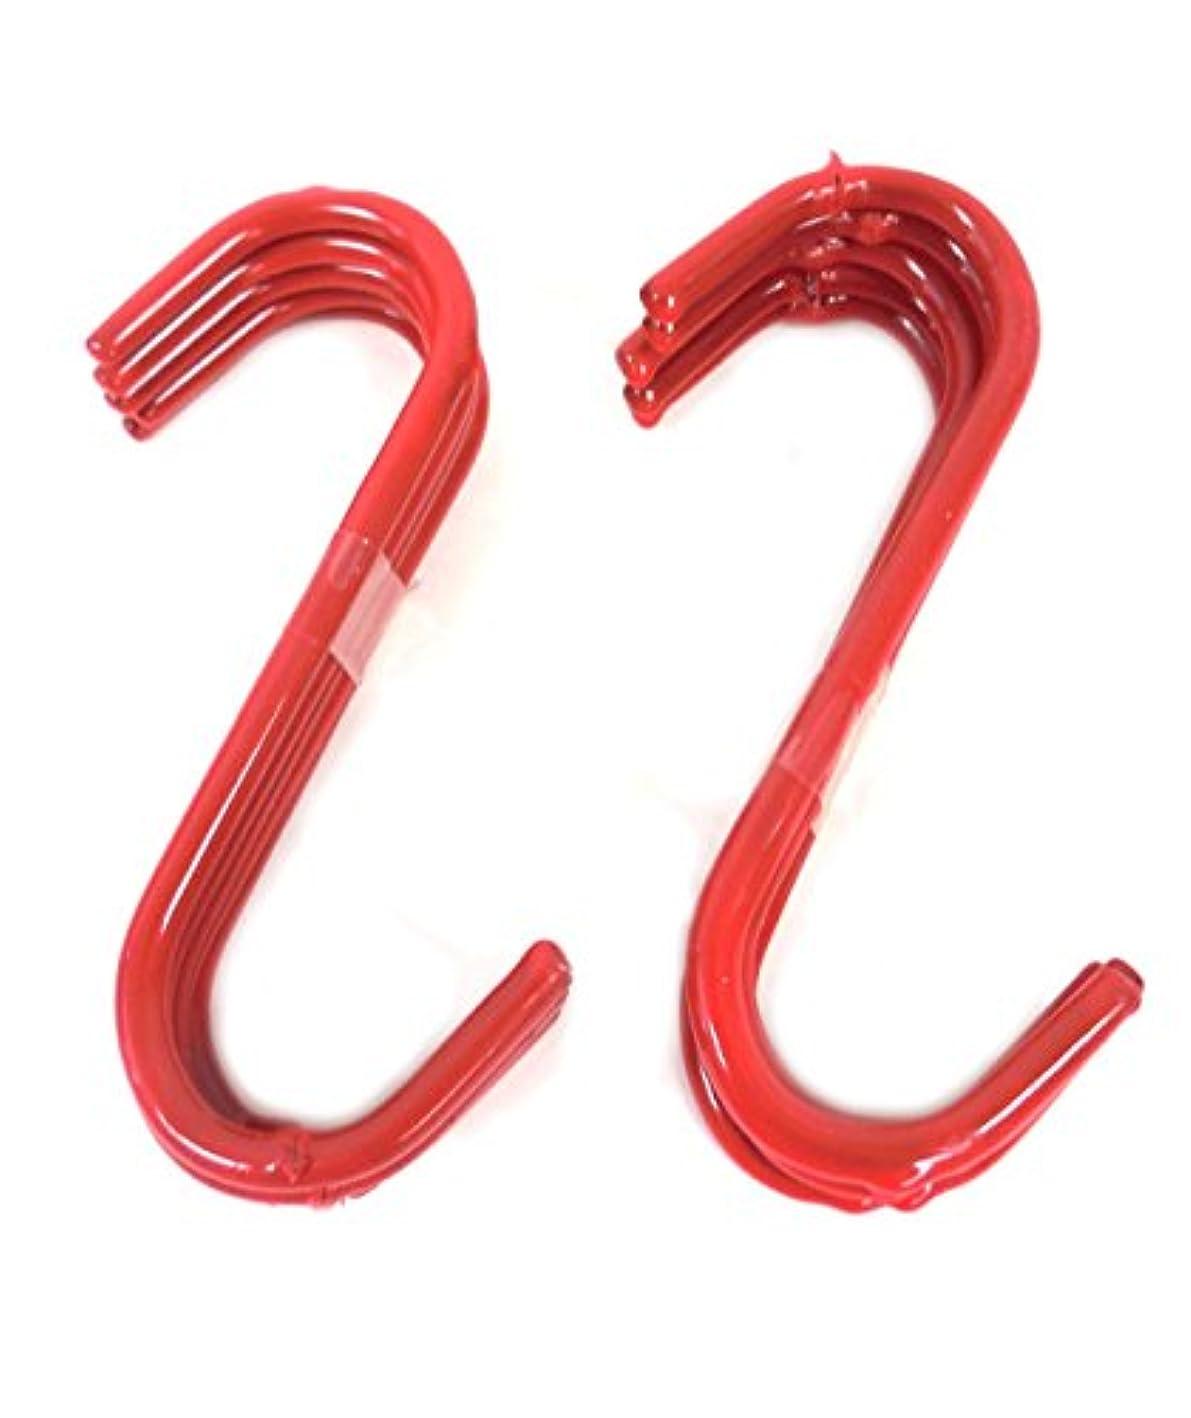 10 pc Utility Hook Set, S Shape by B-PAC